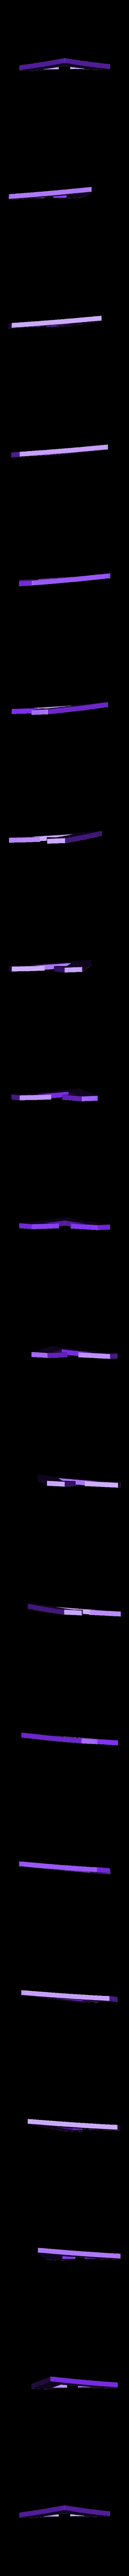 APEX_ENGRAVE_v2.stl Download free STL file Xbox One S Custom Controller Shell: Apex Legend Pathfinder Edition • Design to 3D print, mmjames